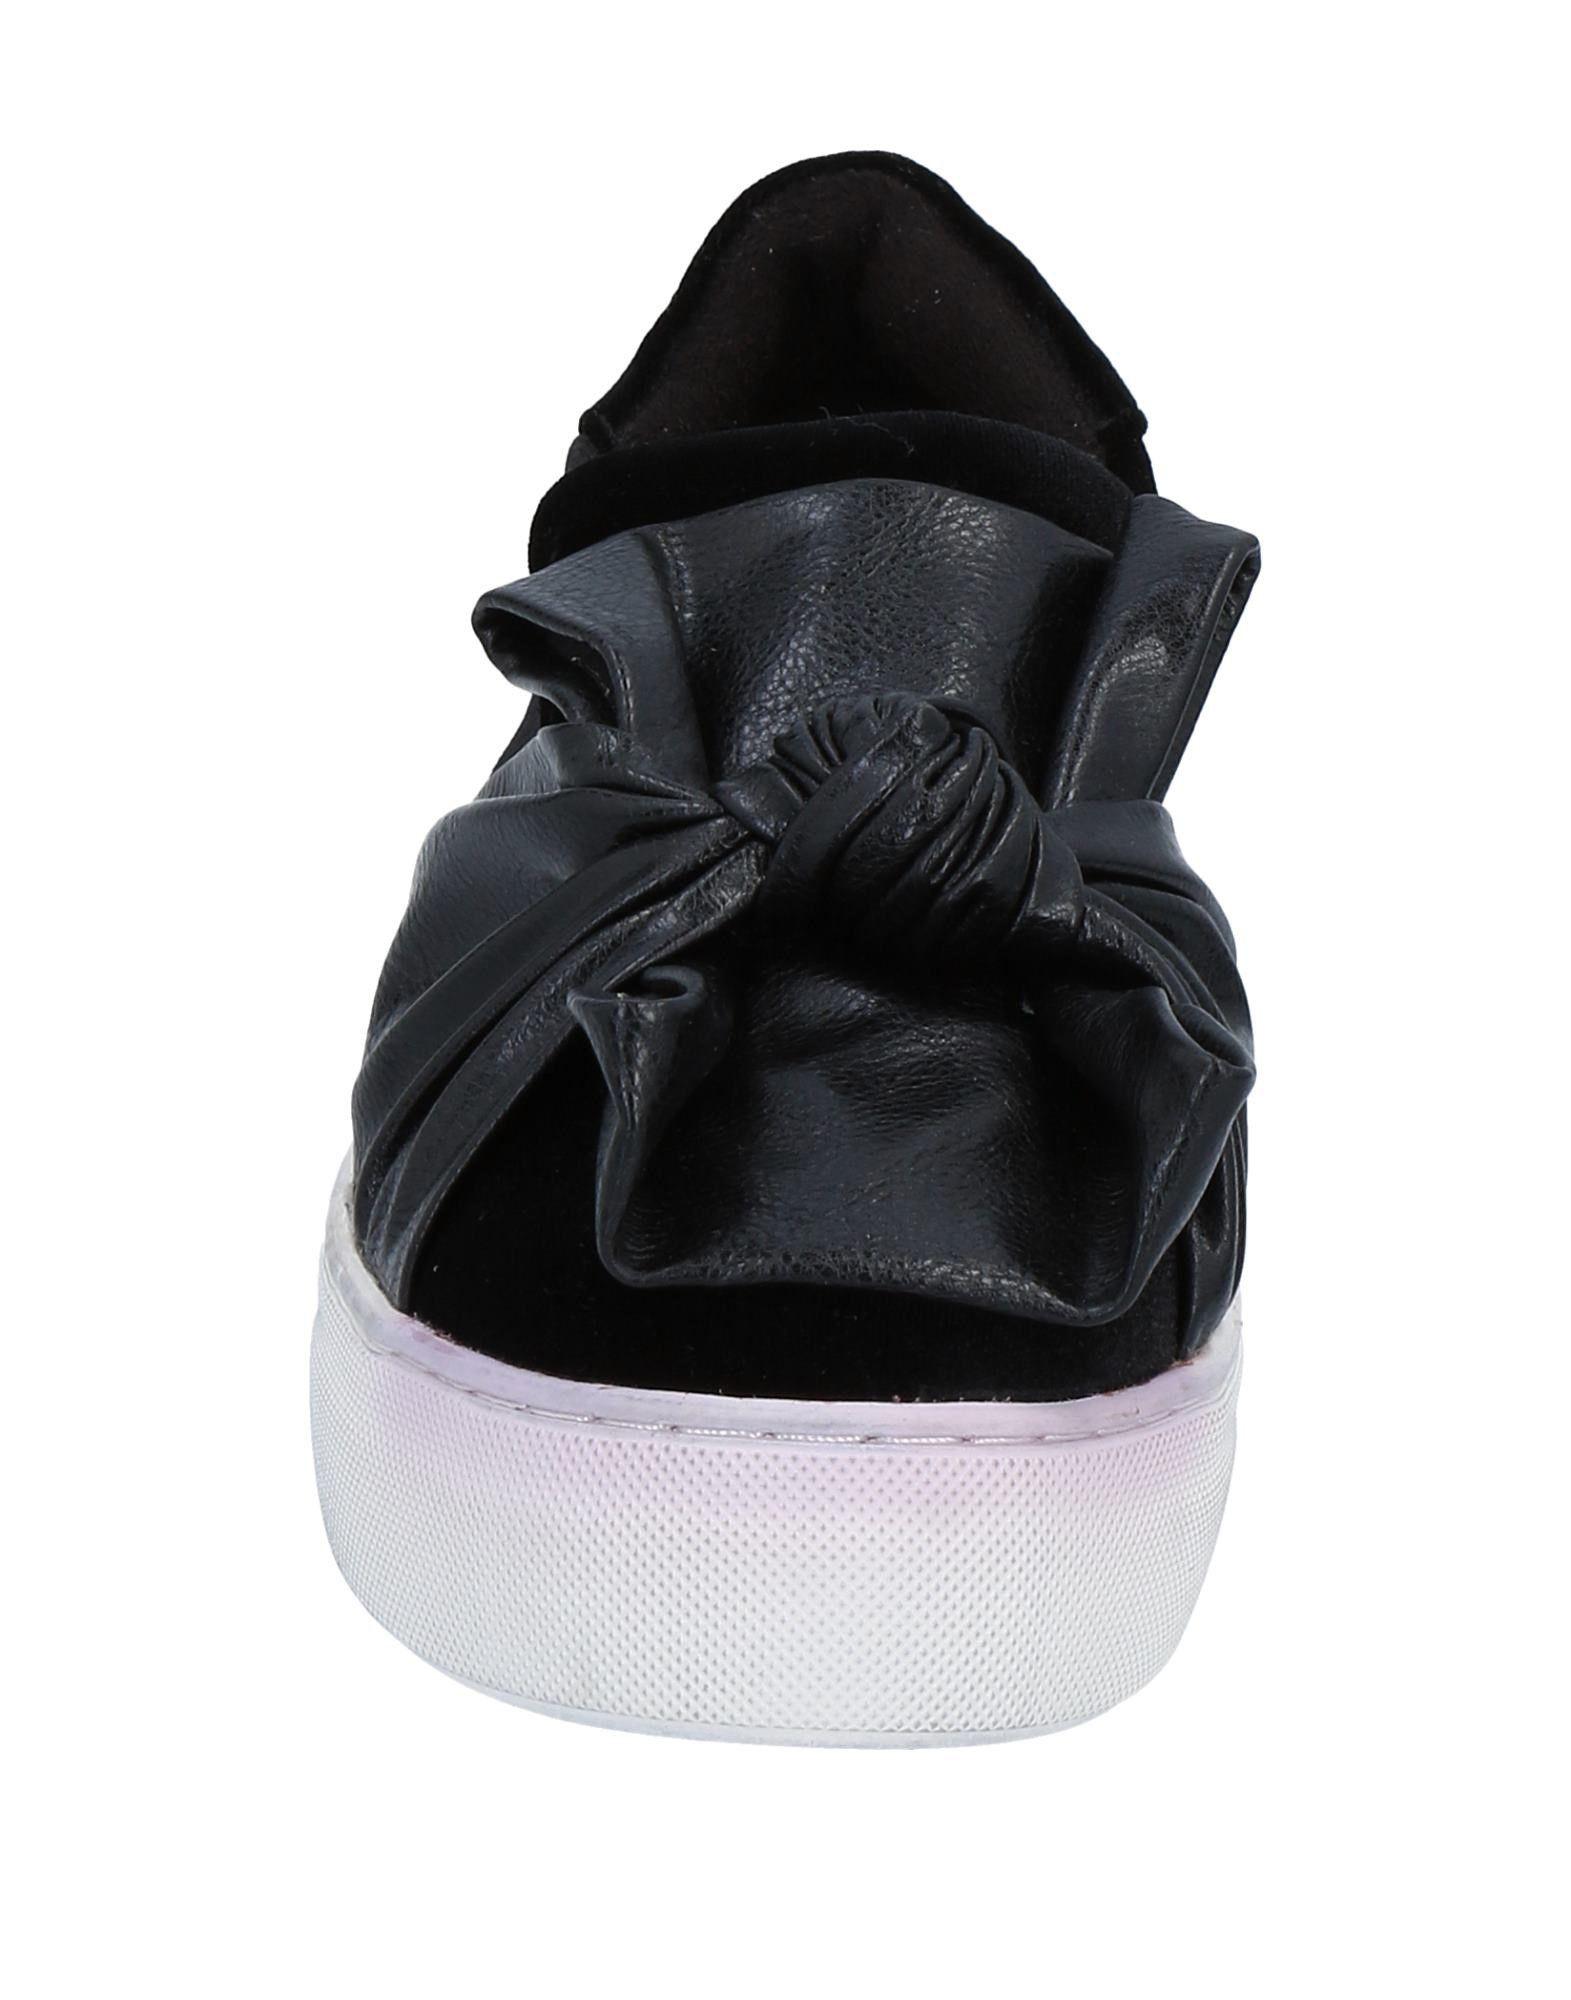 Onako' Gute Sneakers Damen  11529038JQ Gute Onako' Qualität beliebte Schuhe 1ce22f